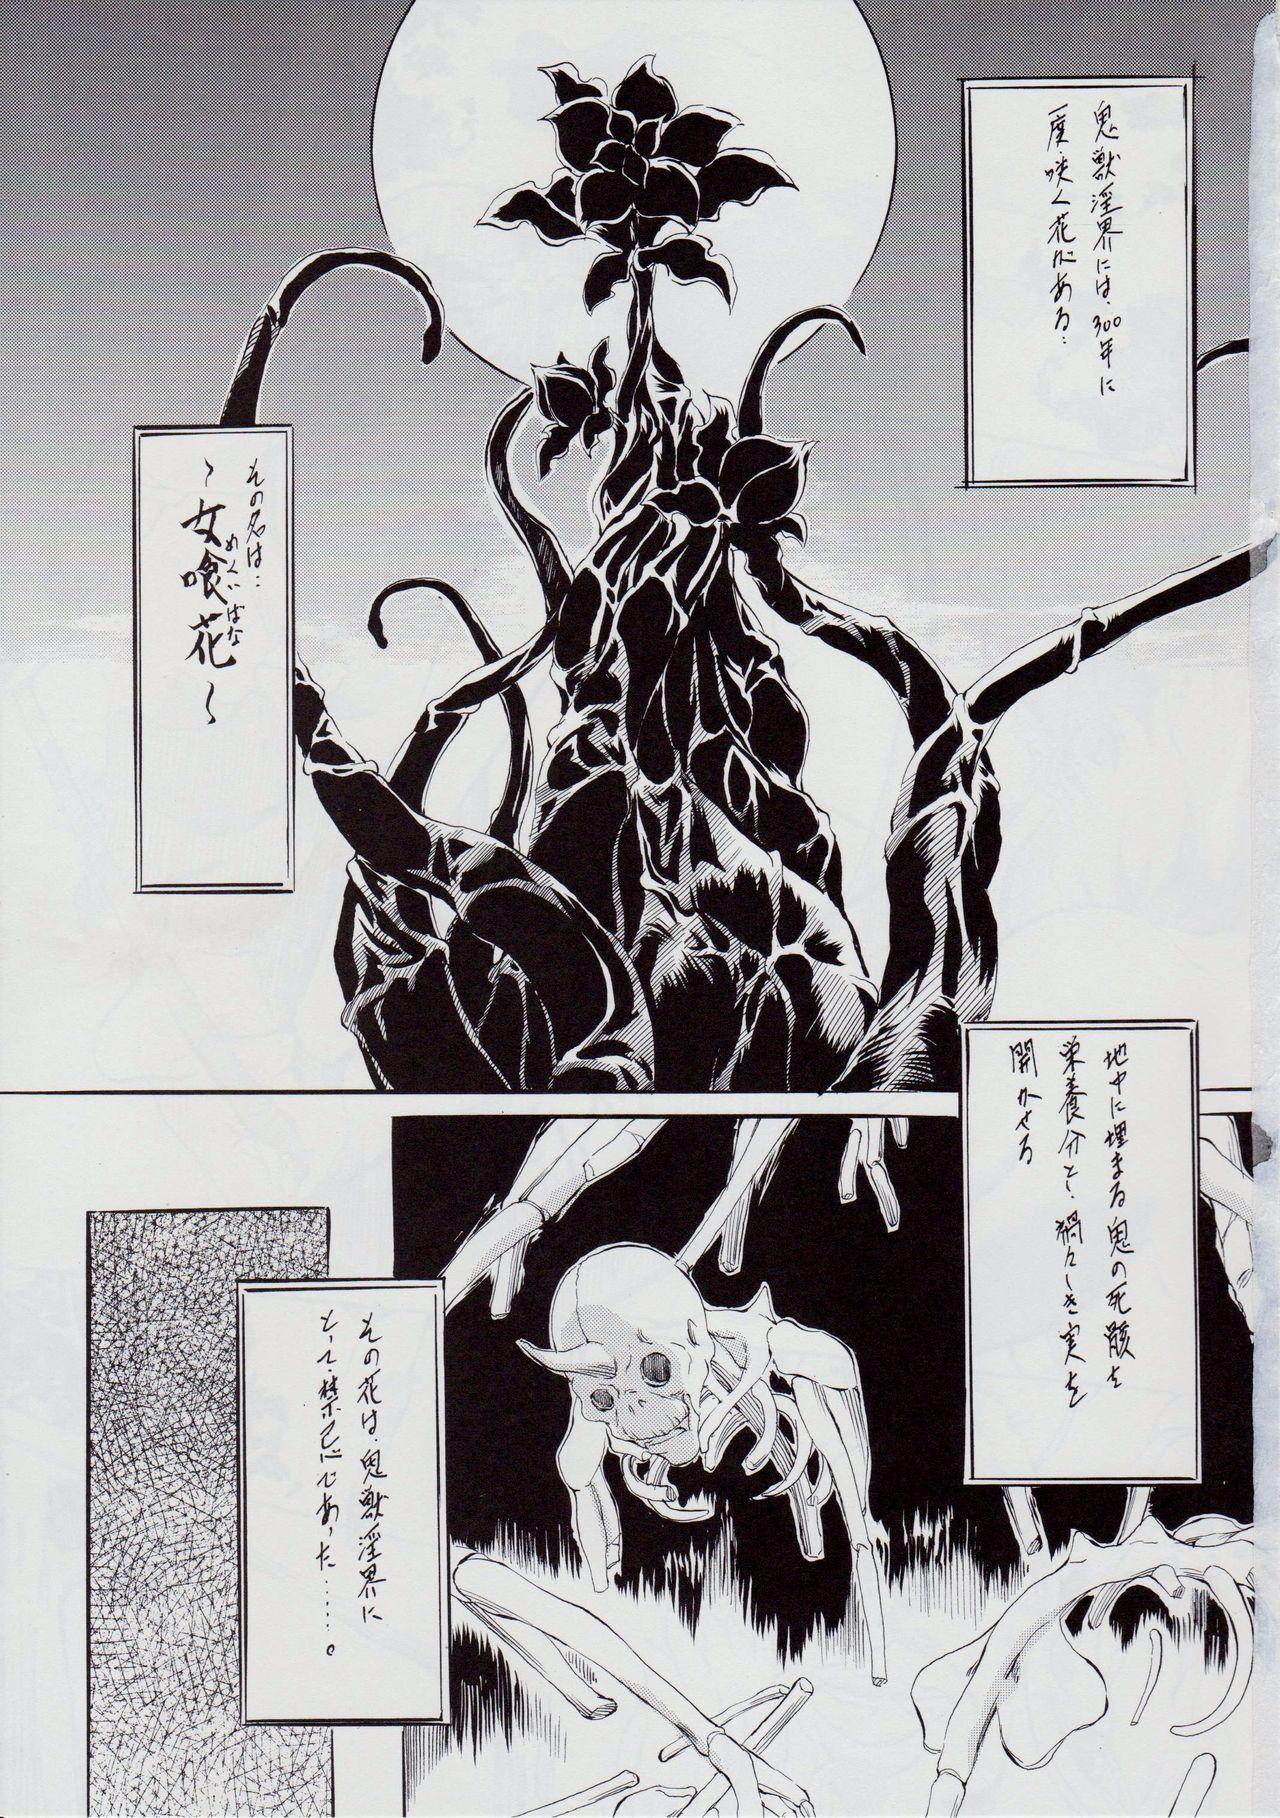 [Busou Megami (Kannaduki Kanna)] 亜衣&麻衣 ~女喰花~ II (Injuu Seisen Twin Angels) 1